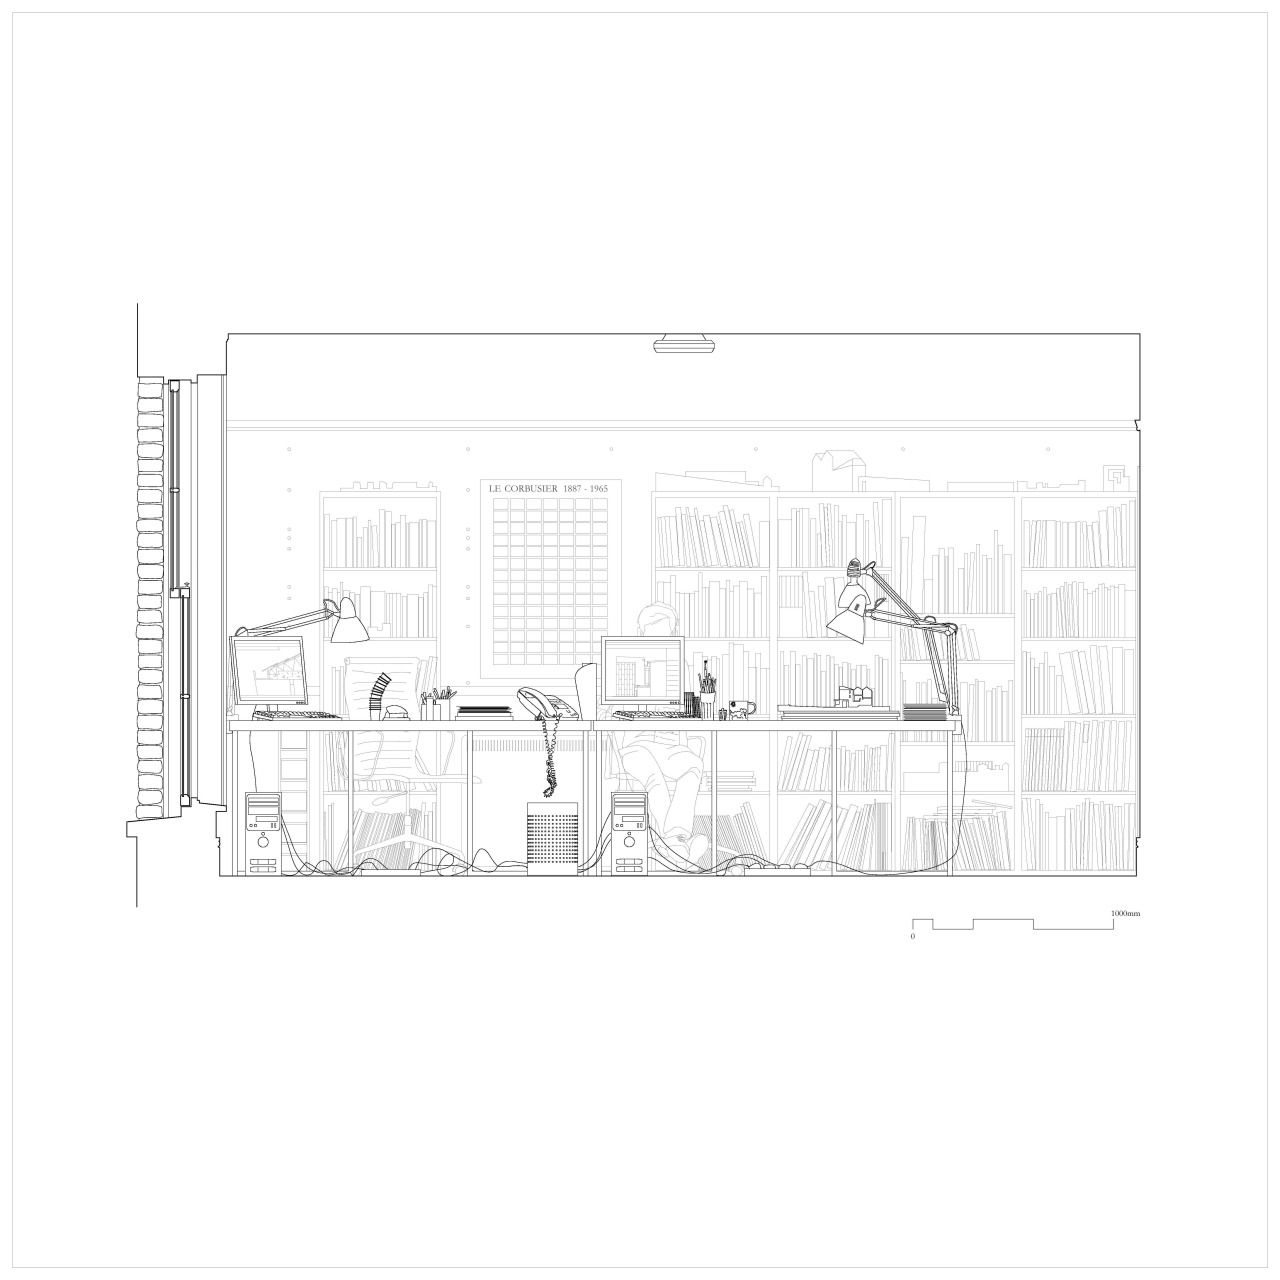 19A Baggot StreetElevation drawing of GKMP Architects office, Baggot Street, Dublin. Image Copyright © 2014 | Jennifer O'Donnell, Jonathan Janssens